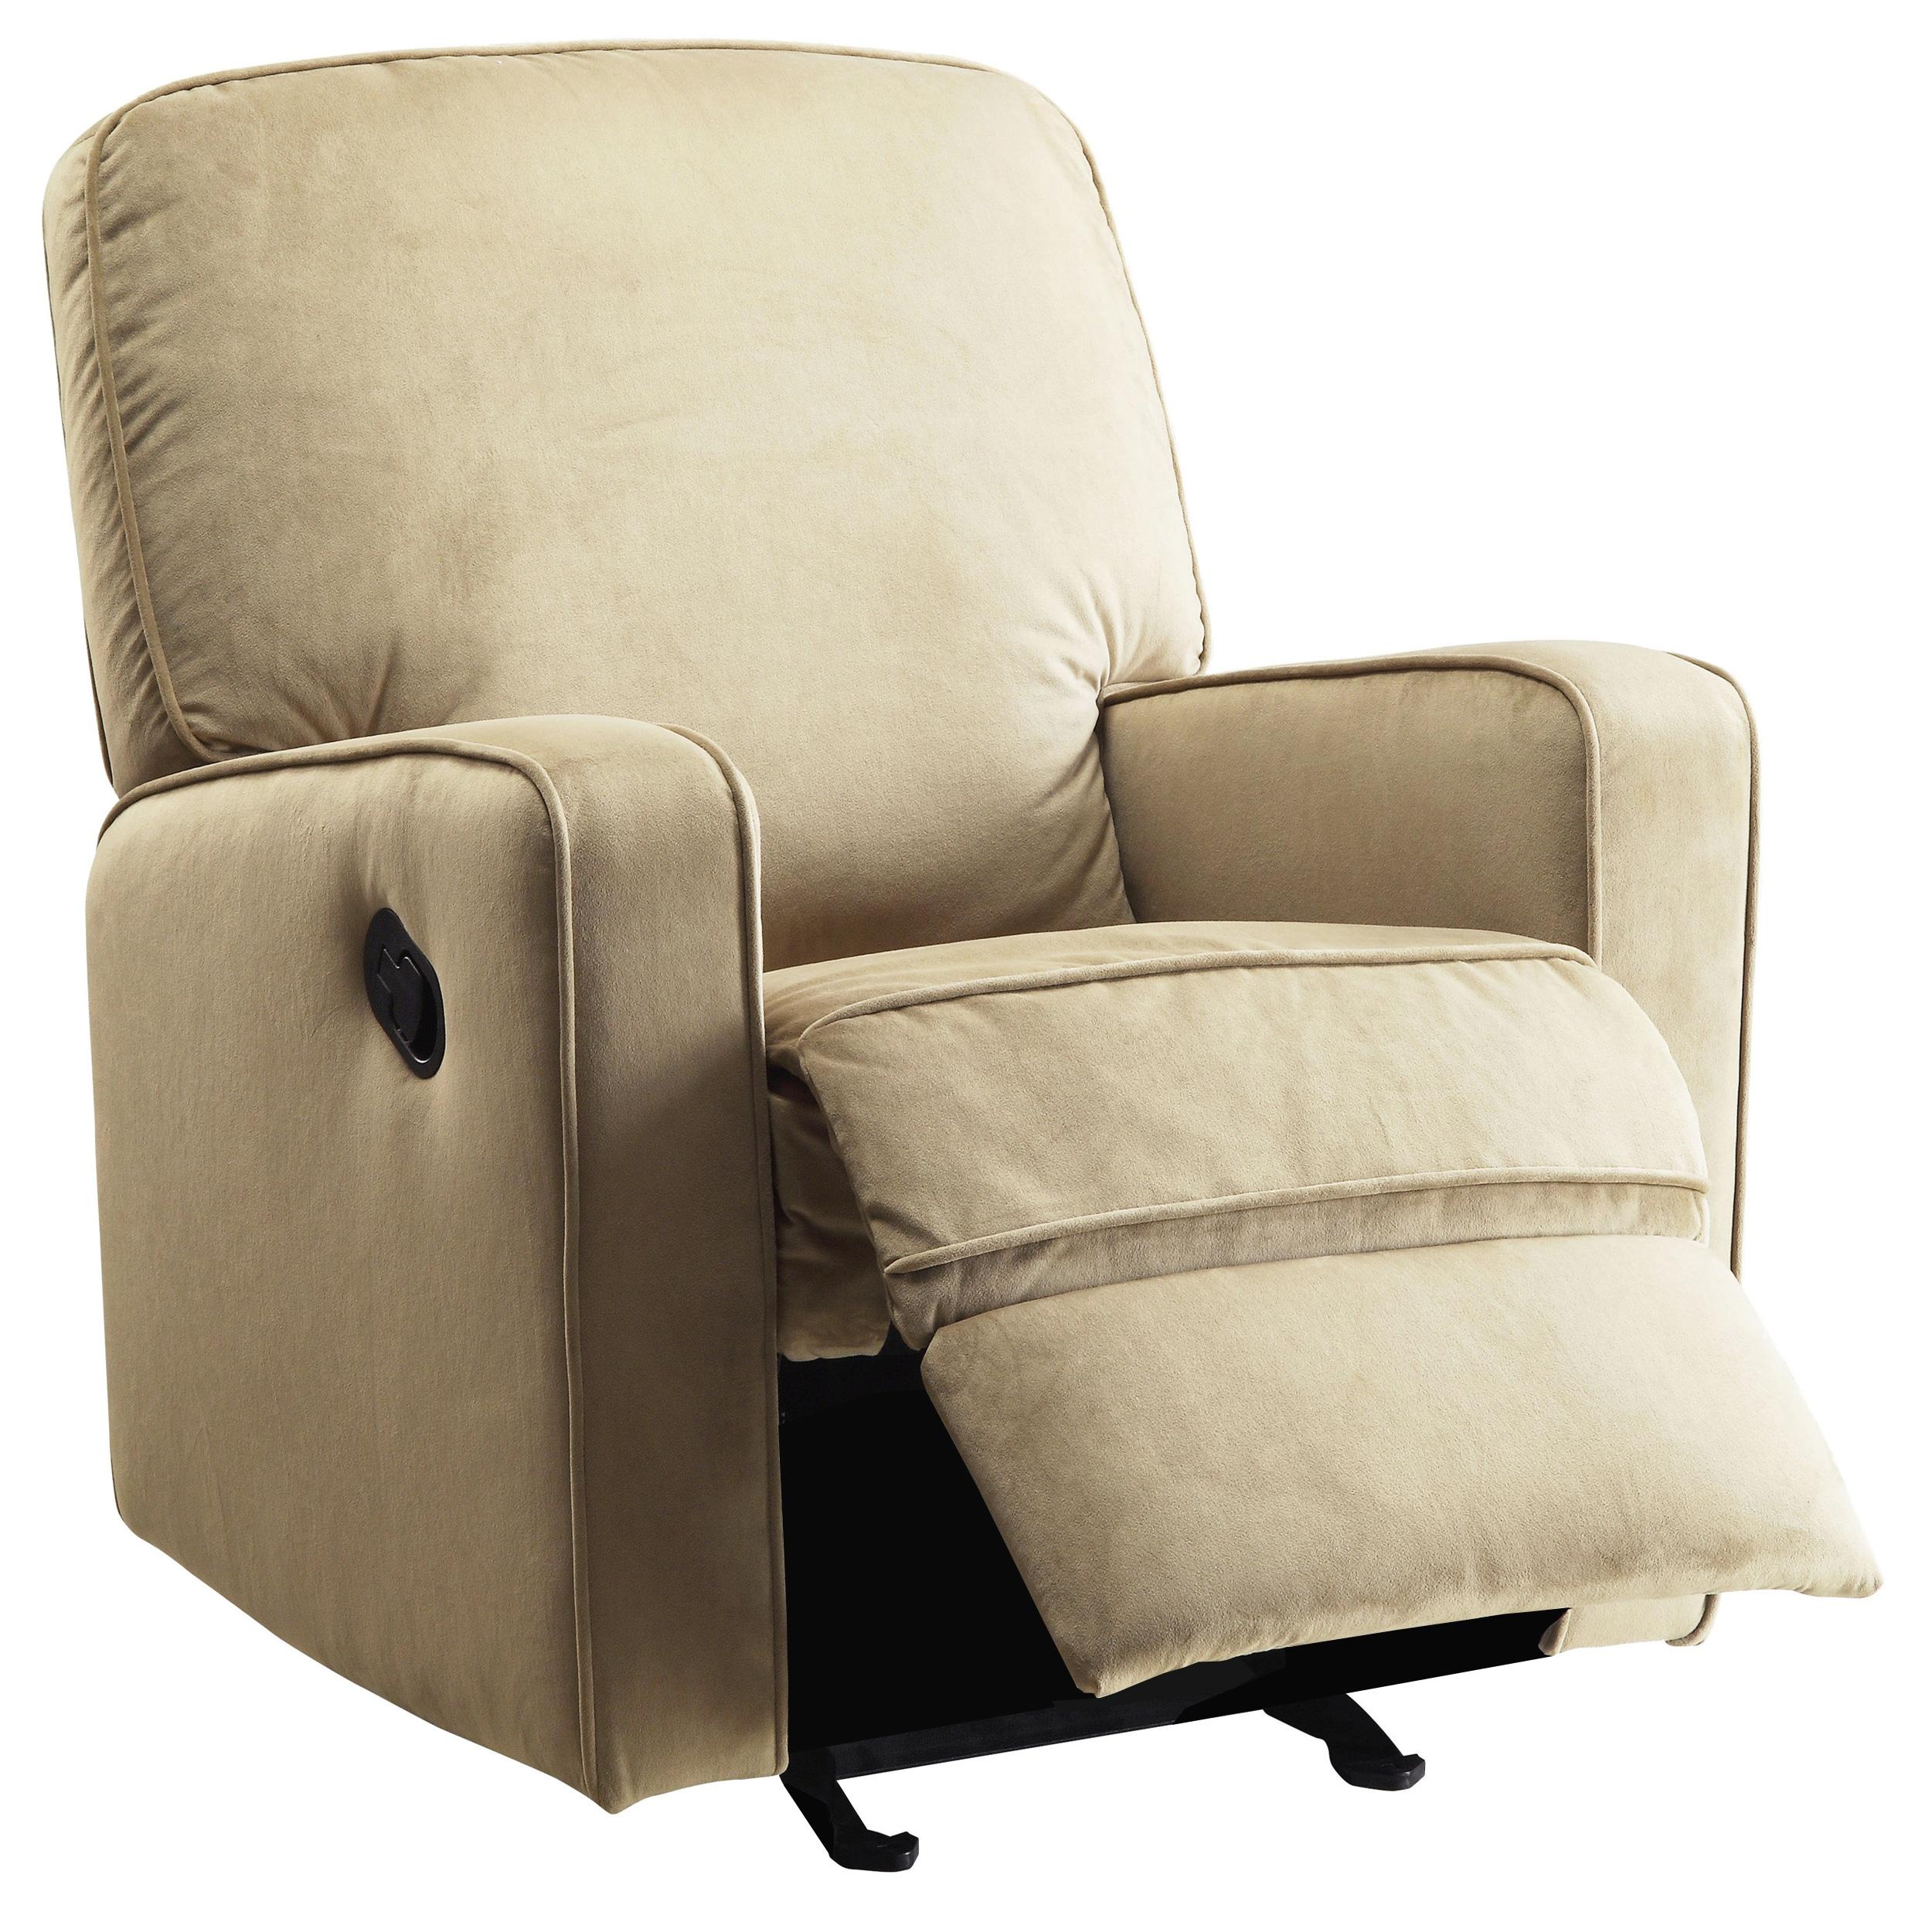 Modern Nursery Swivel Glider Recliner Chair